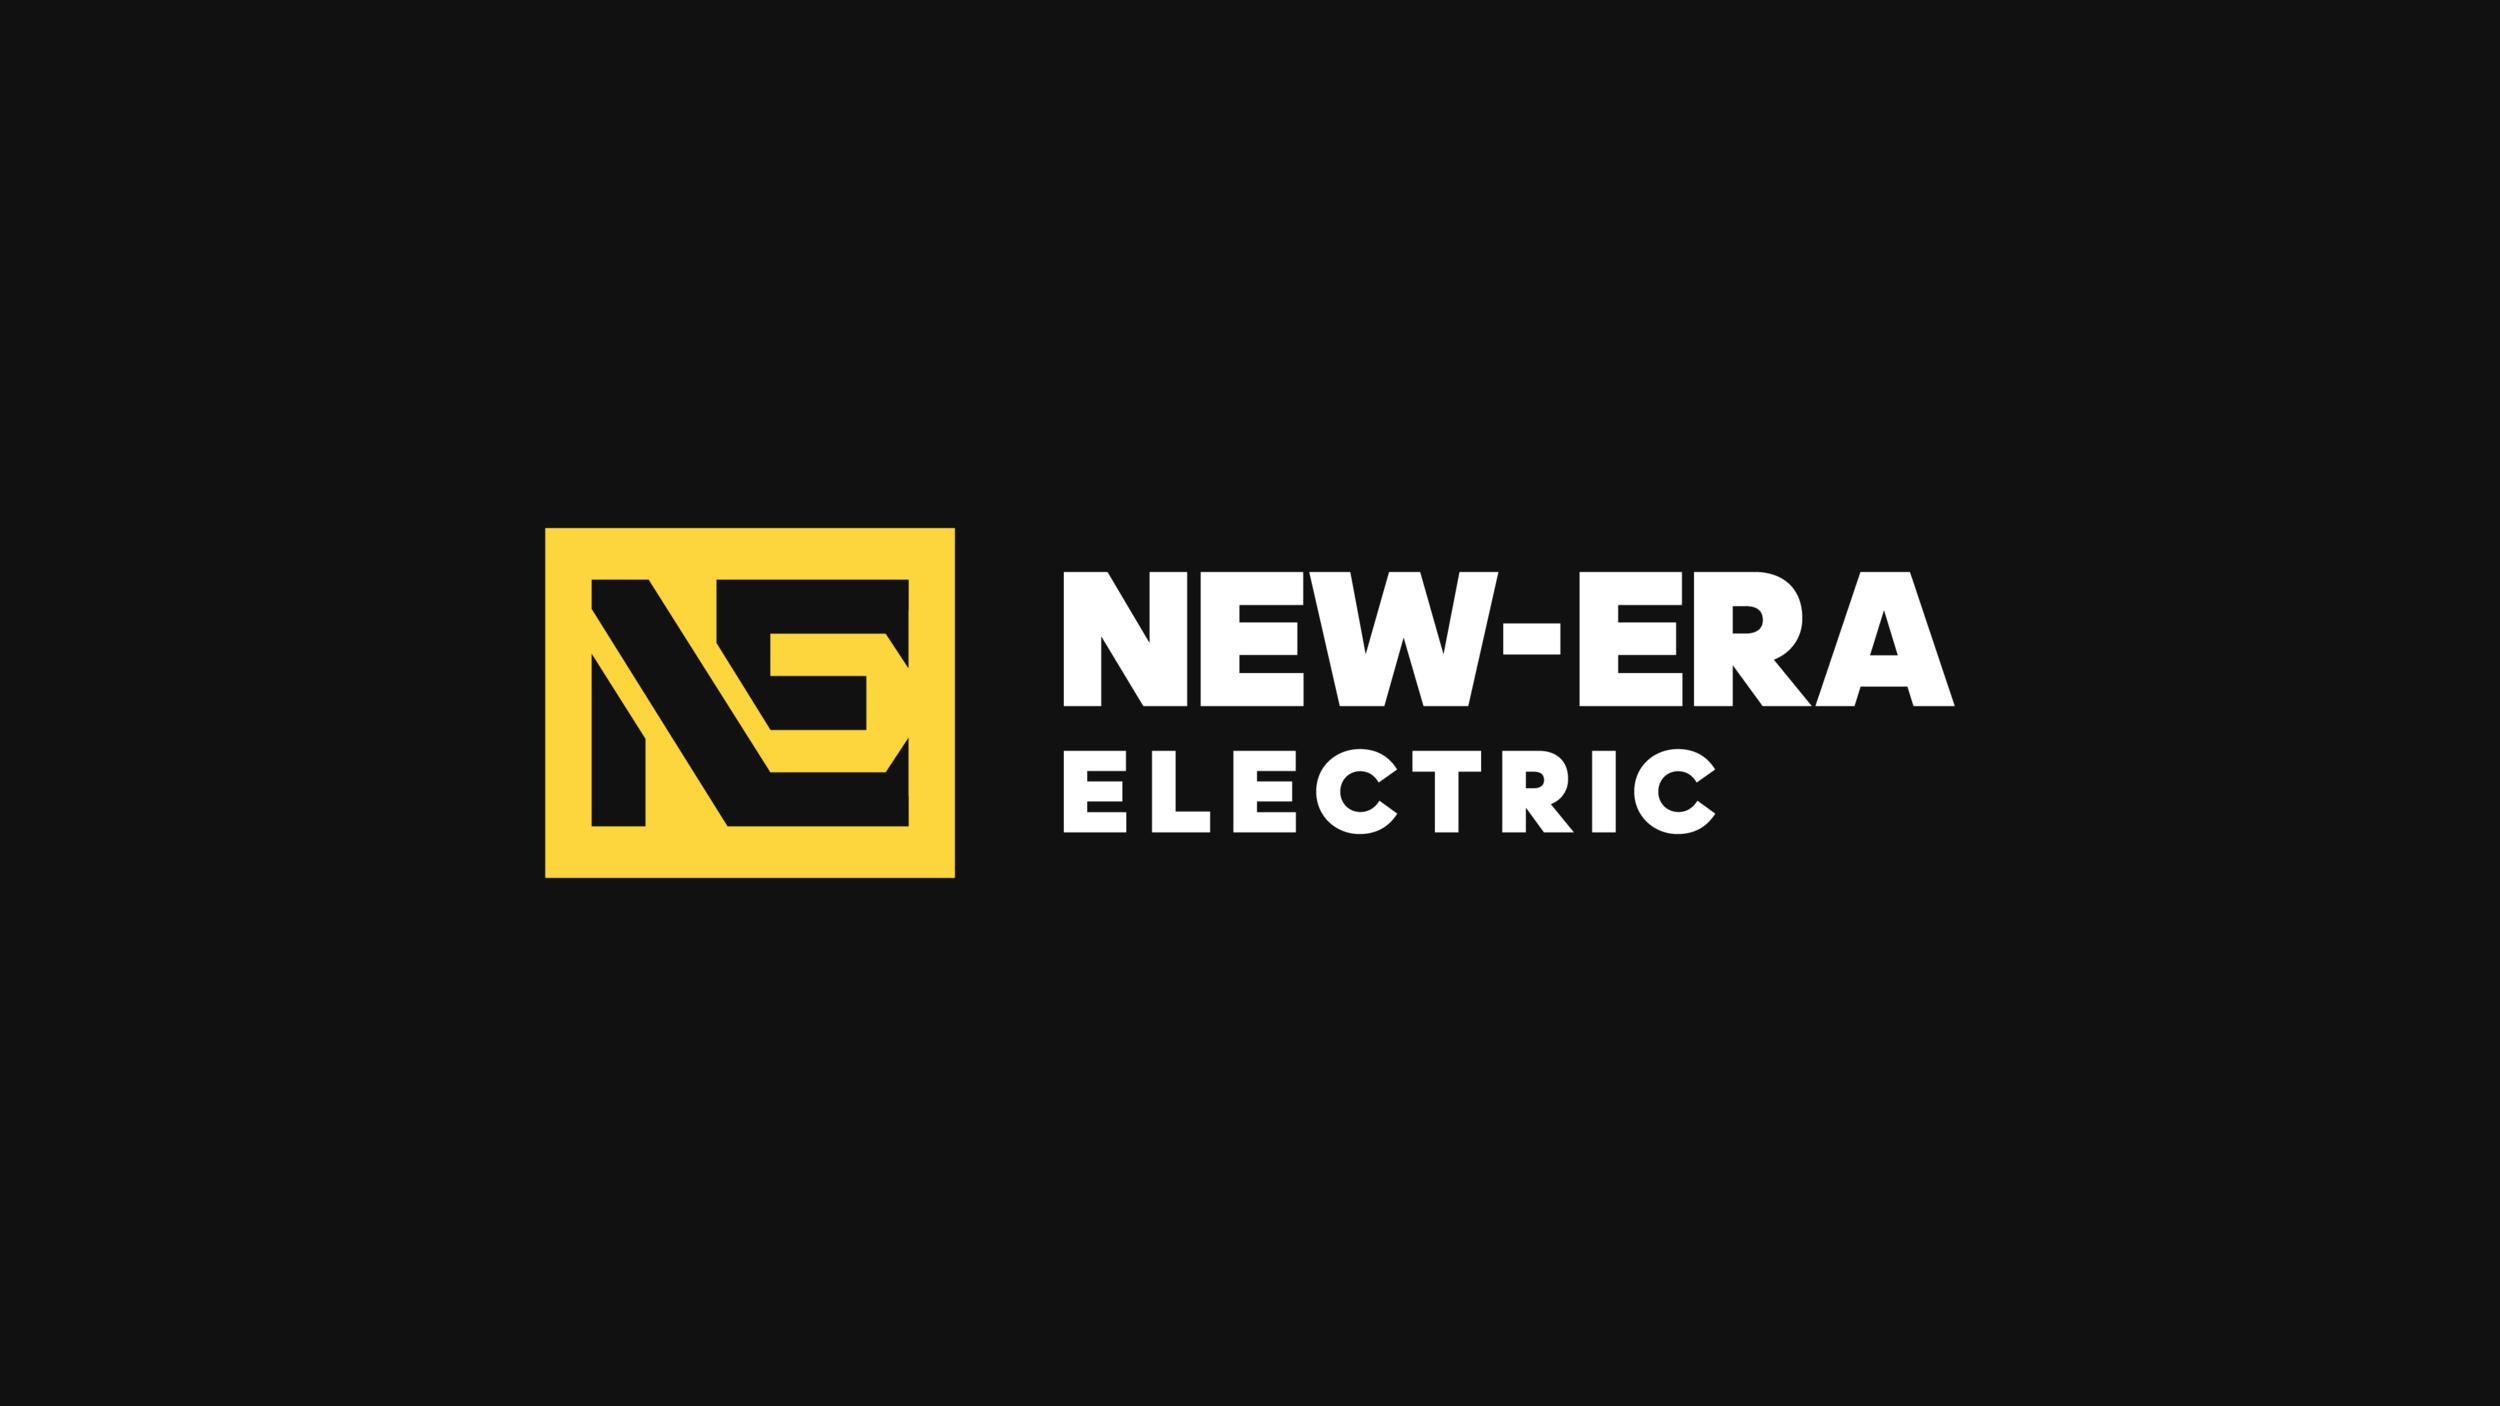 New Era Electric  - Brand Identity